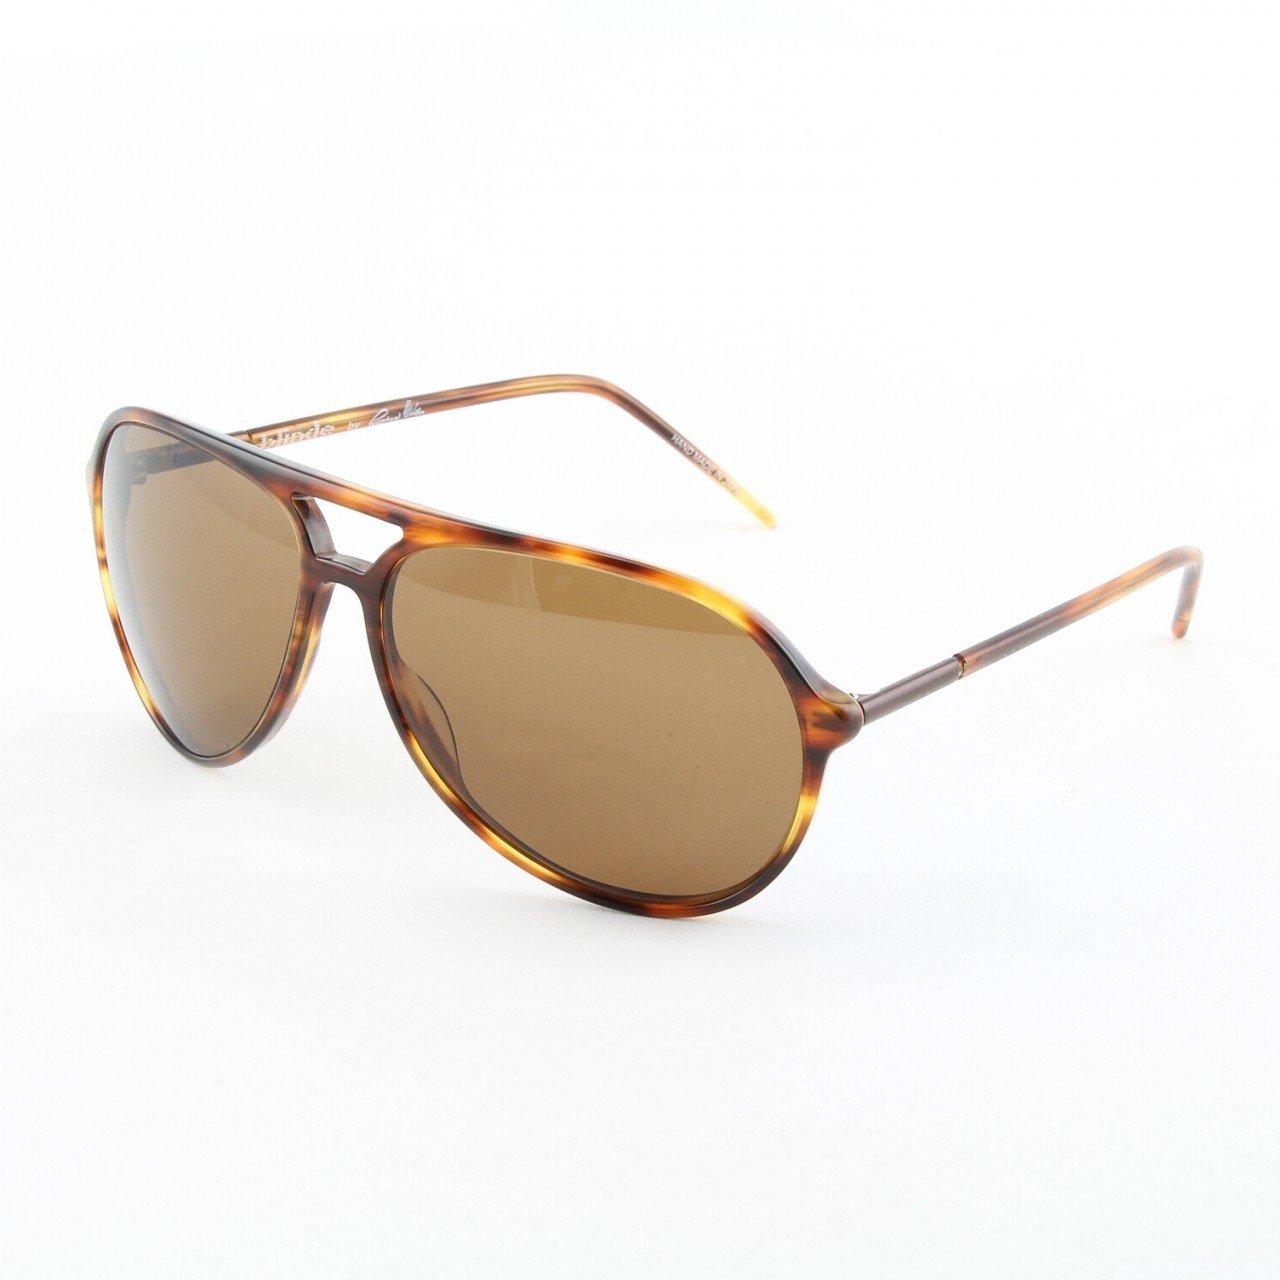 Blinde Joy Rides Men's Sunglasses Col. Tortoise with Brown Lenses